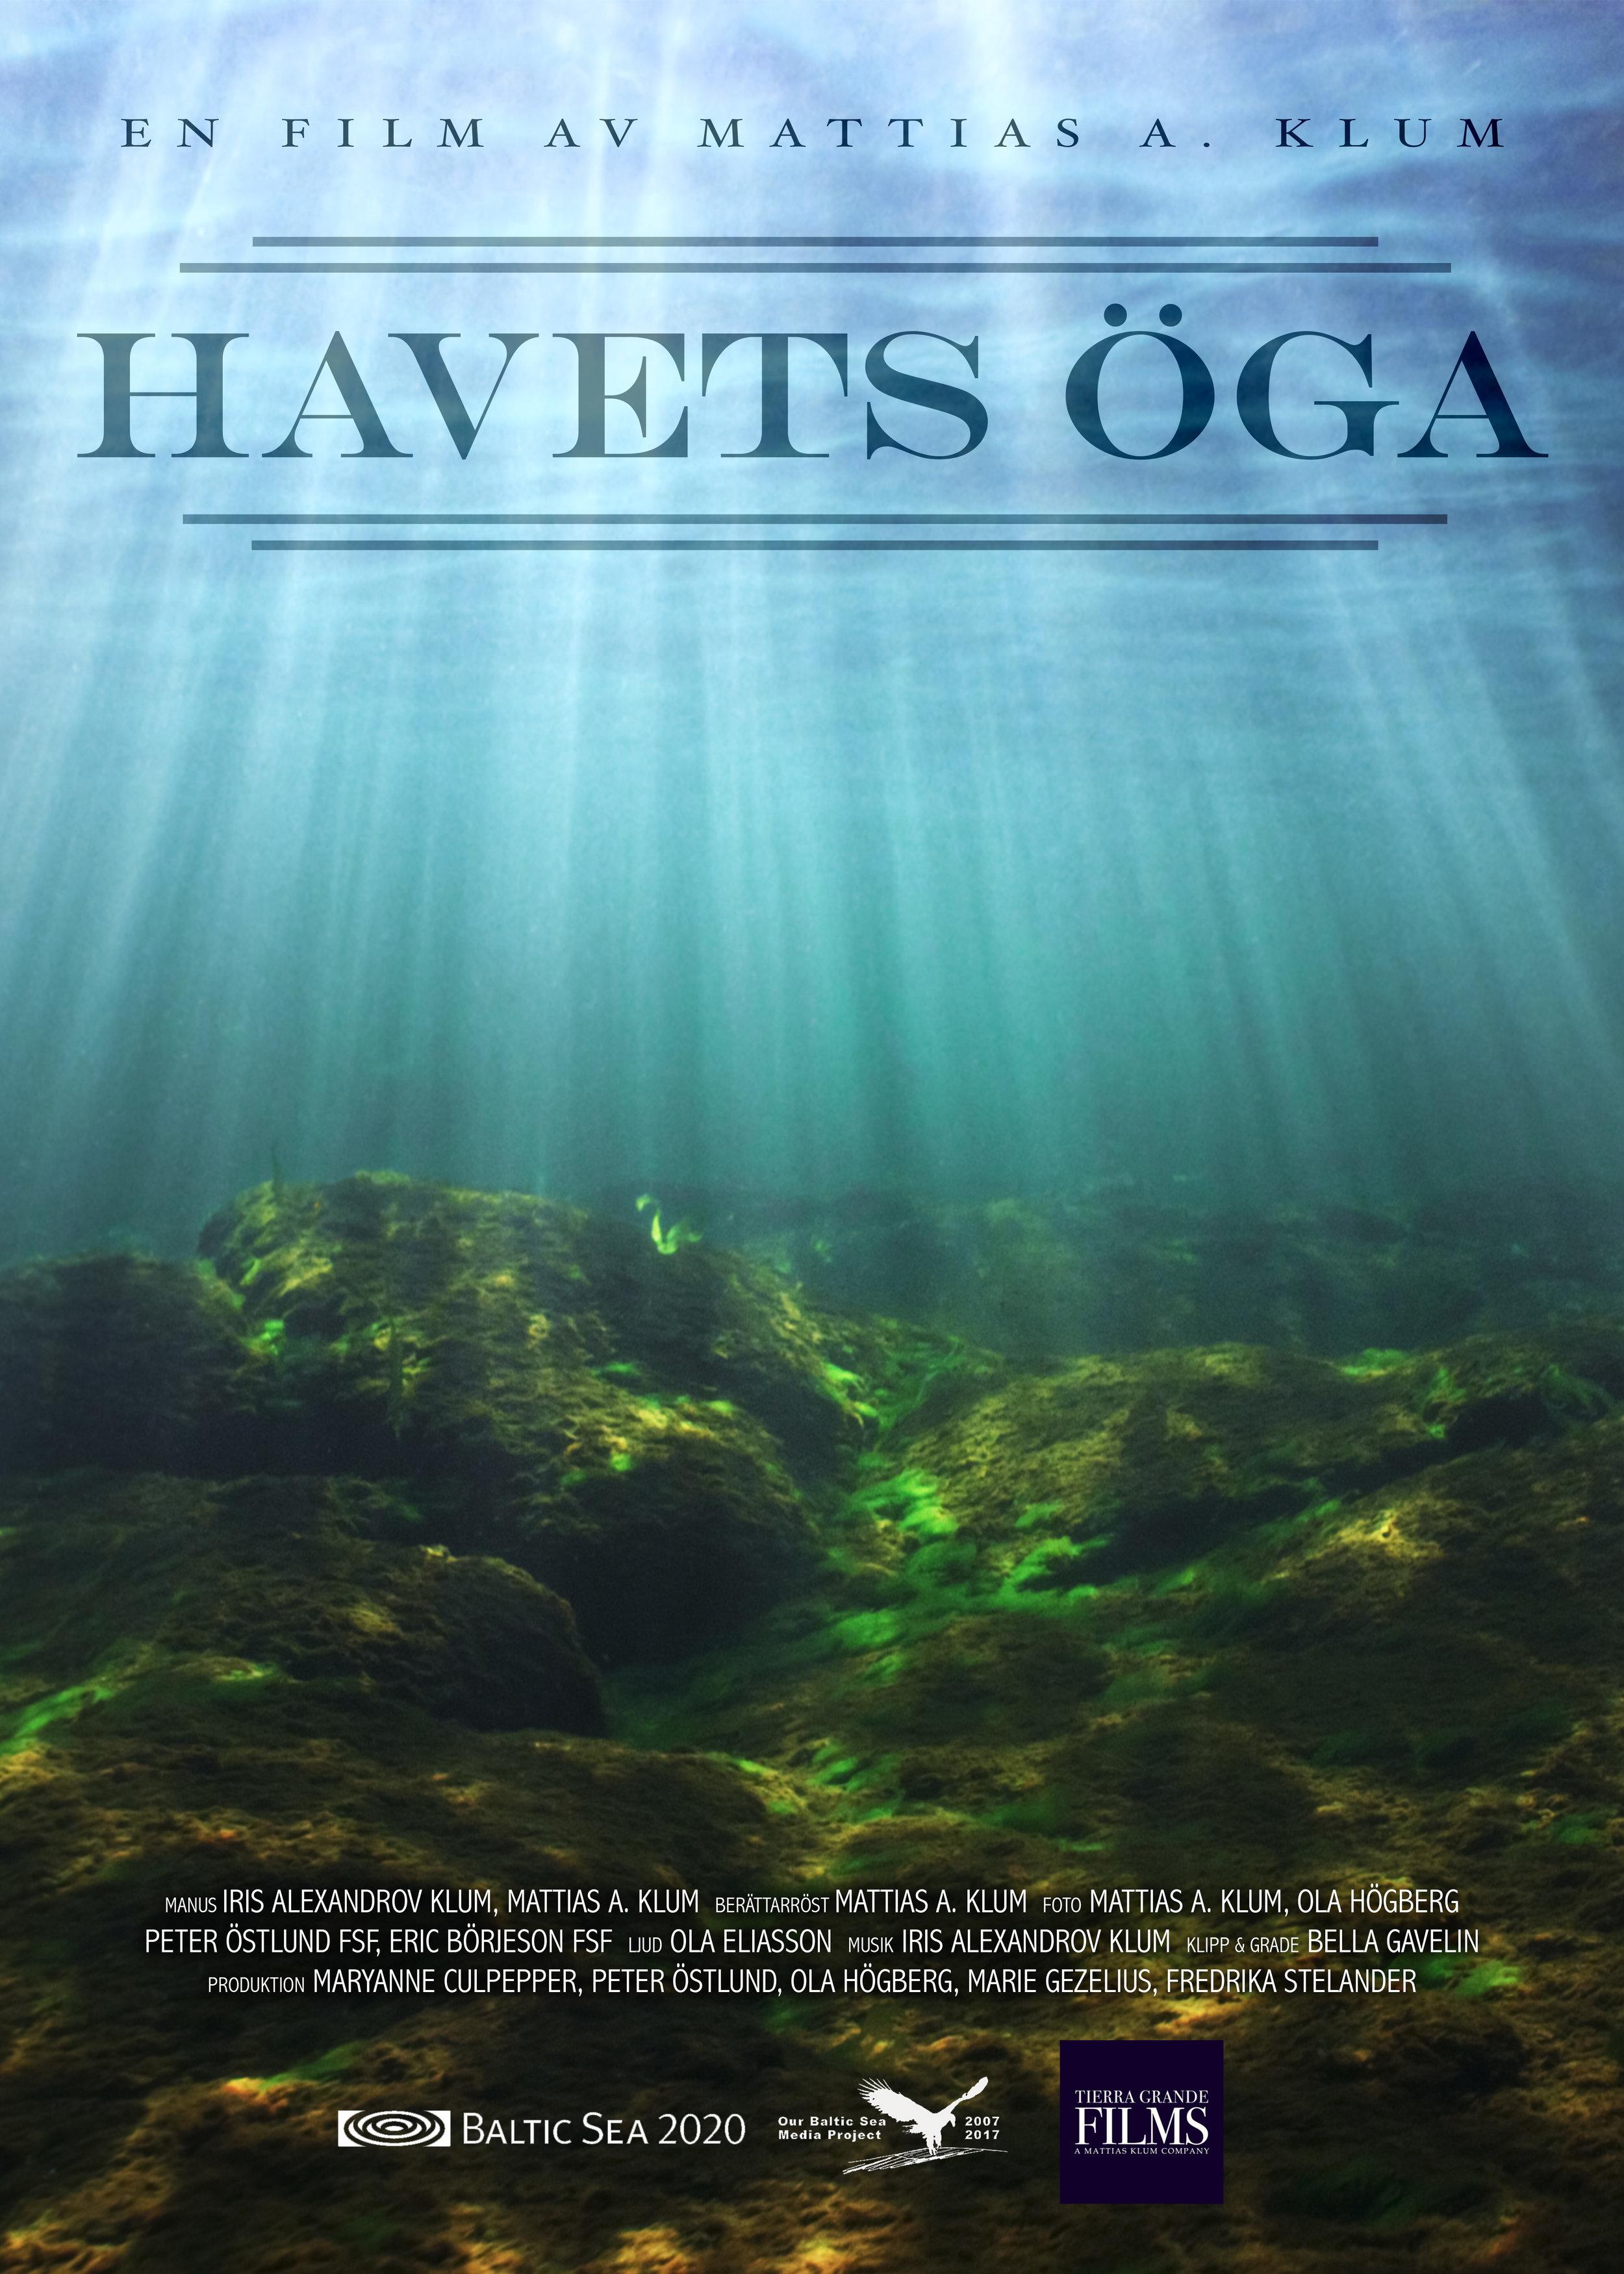 Havets öga affisch poster.jpg